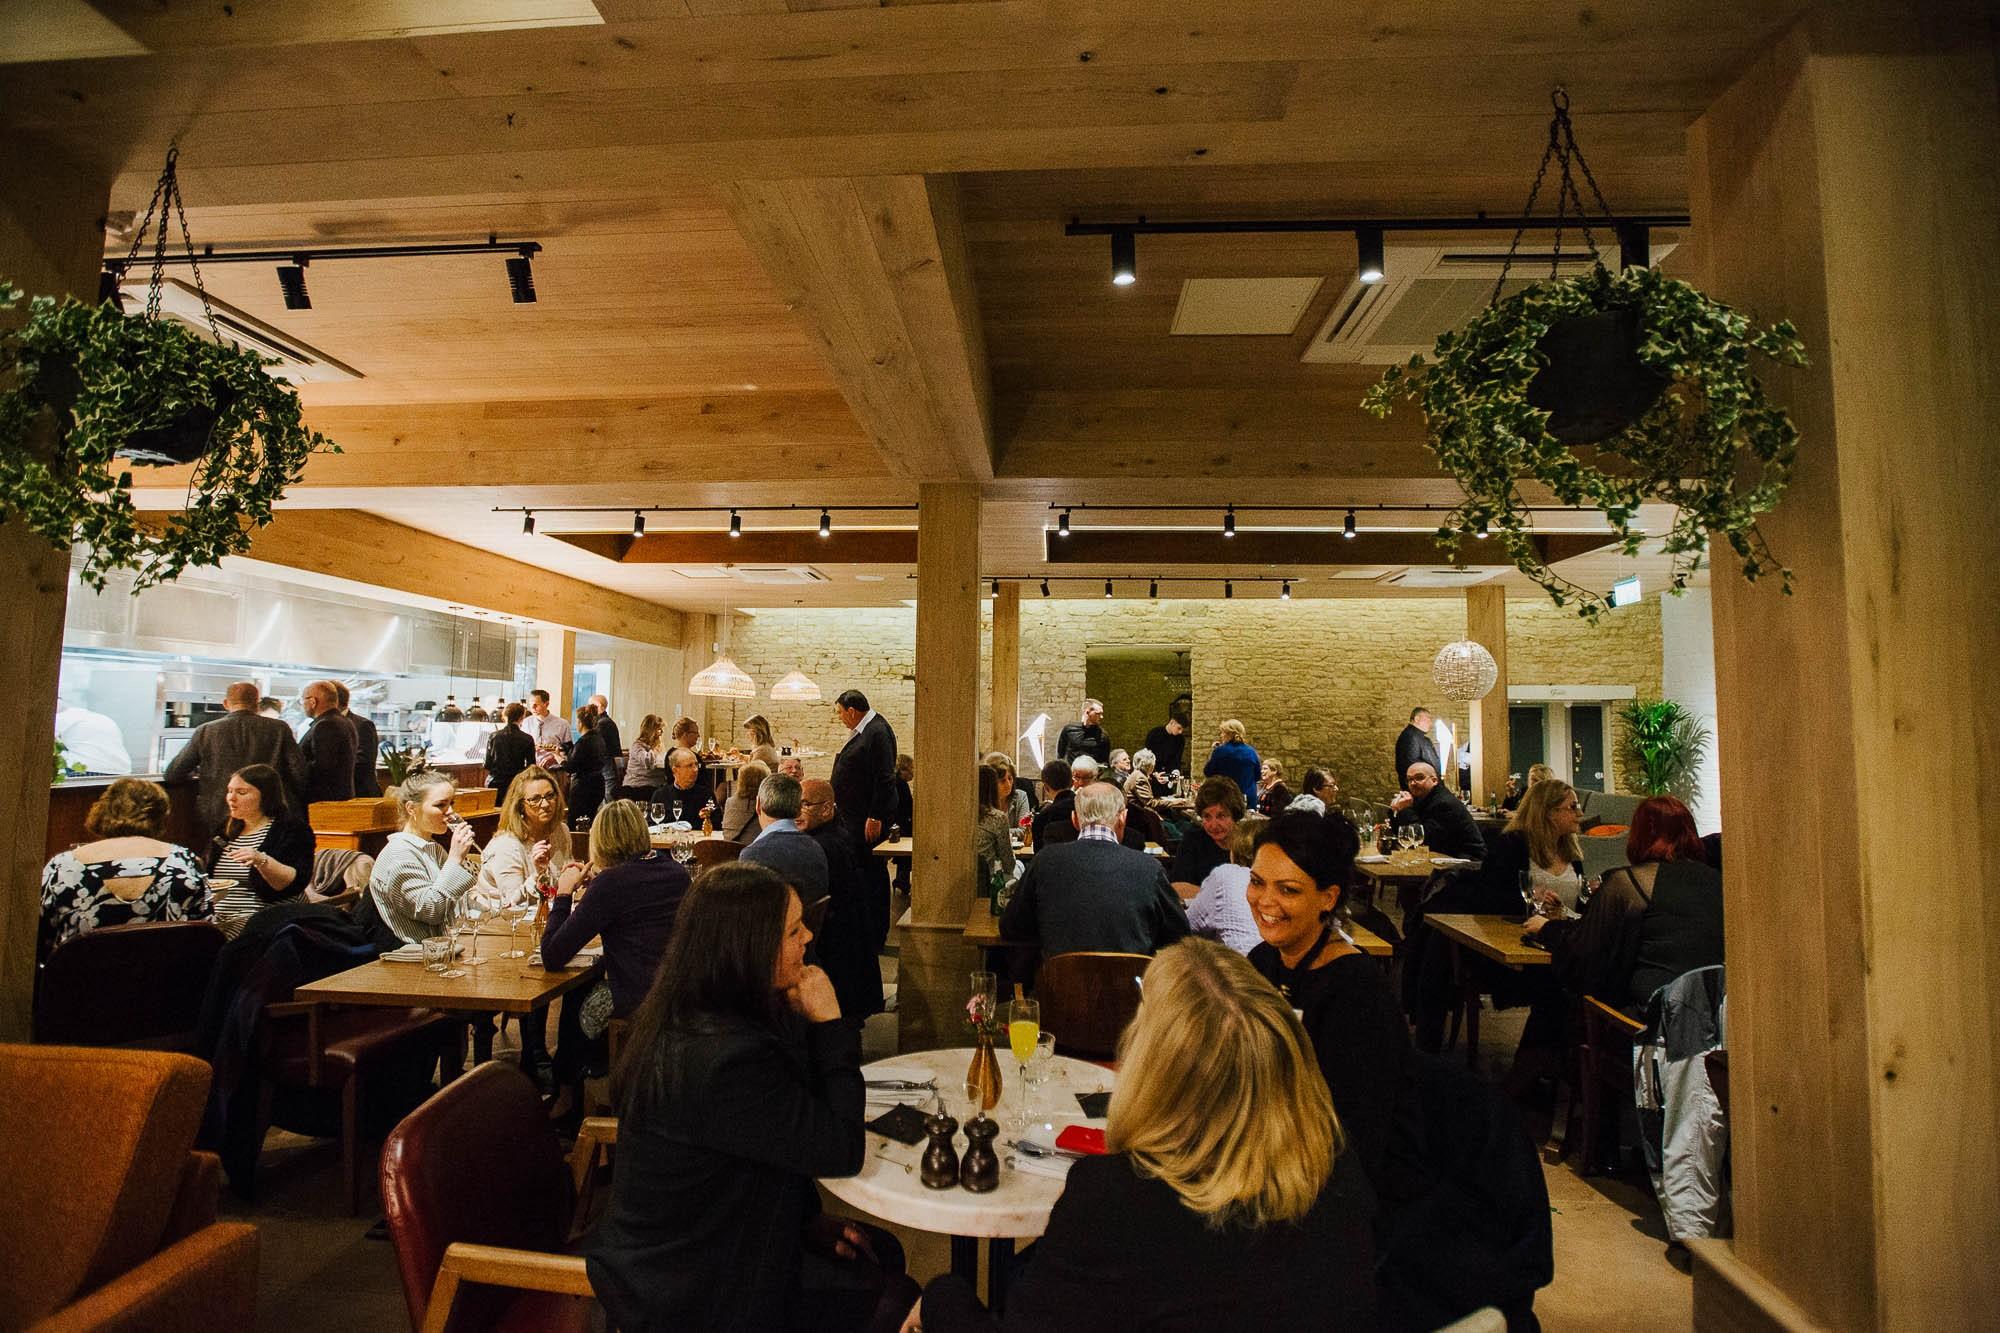 The Restaurant of the Cherry Tree pub in Olney, Buckinghamshire